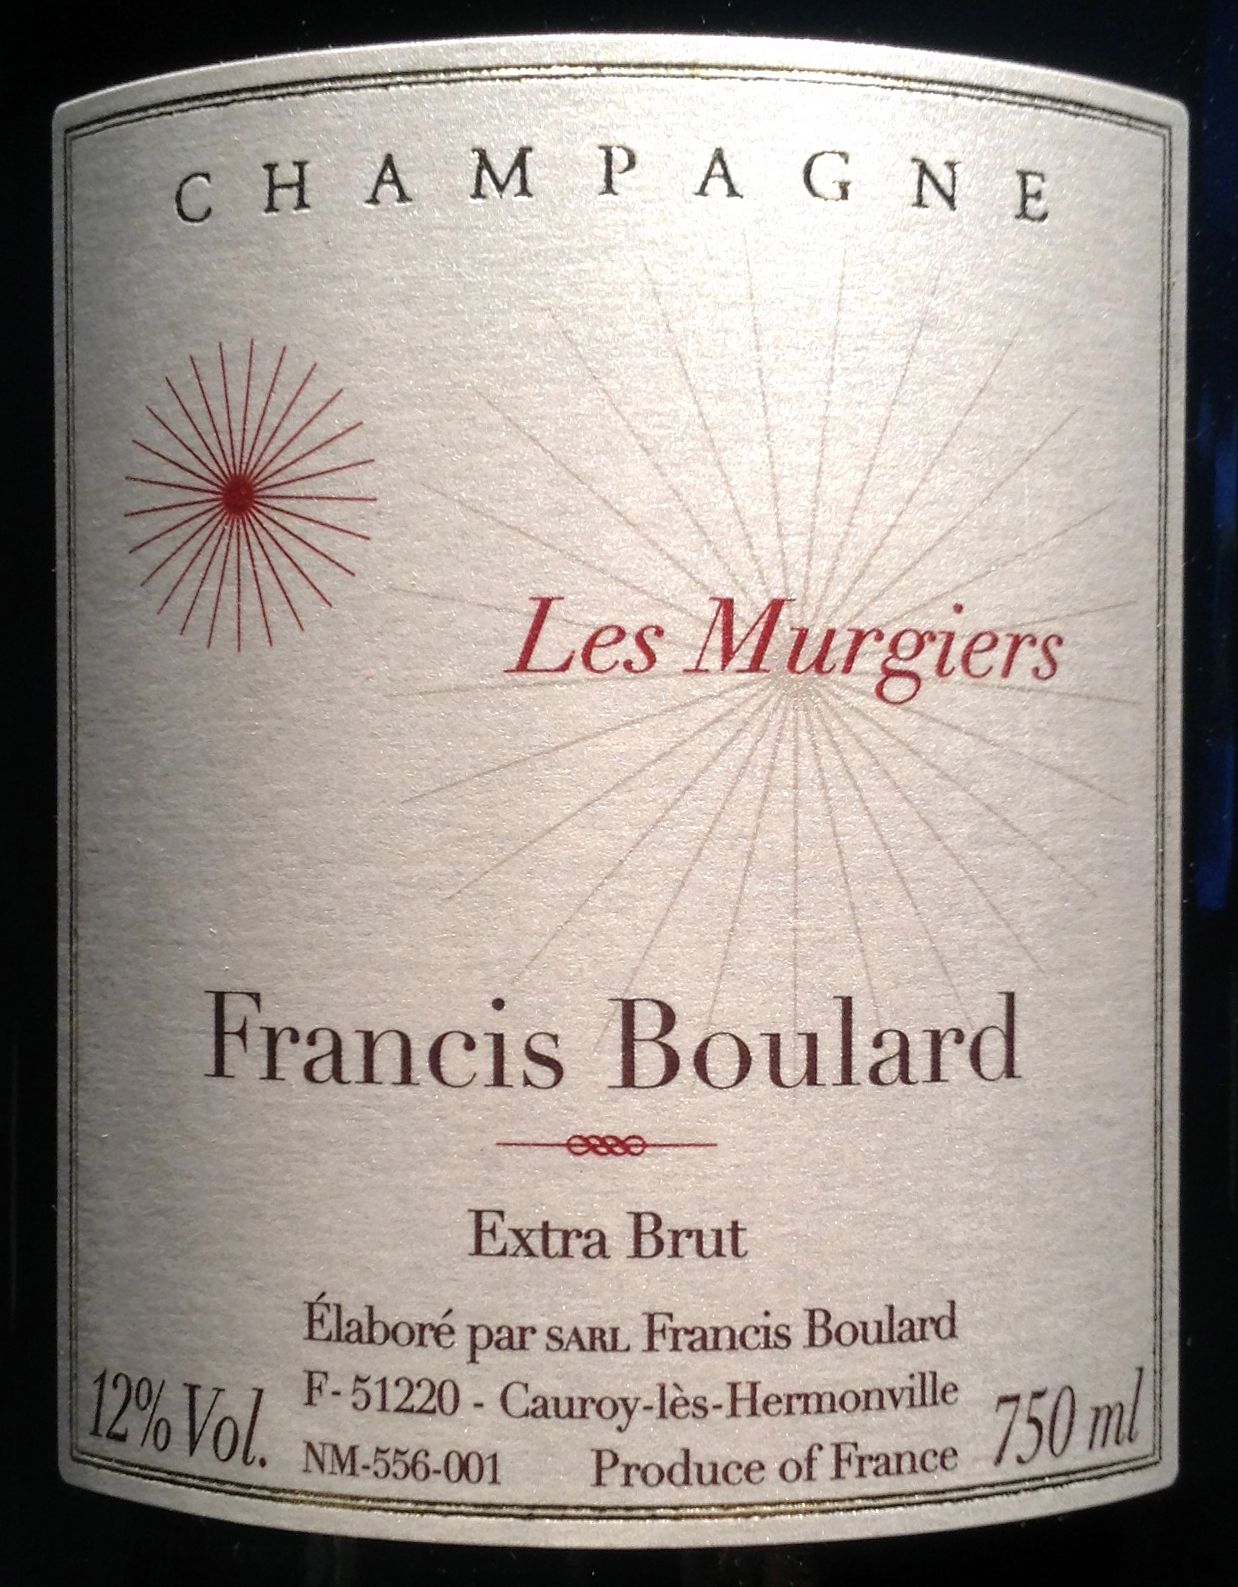 EINMALIGE VERWENDUNG 5: Cuvées / Francis Boulard, Cauroy-lès-Hermonville